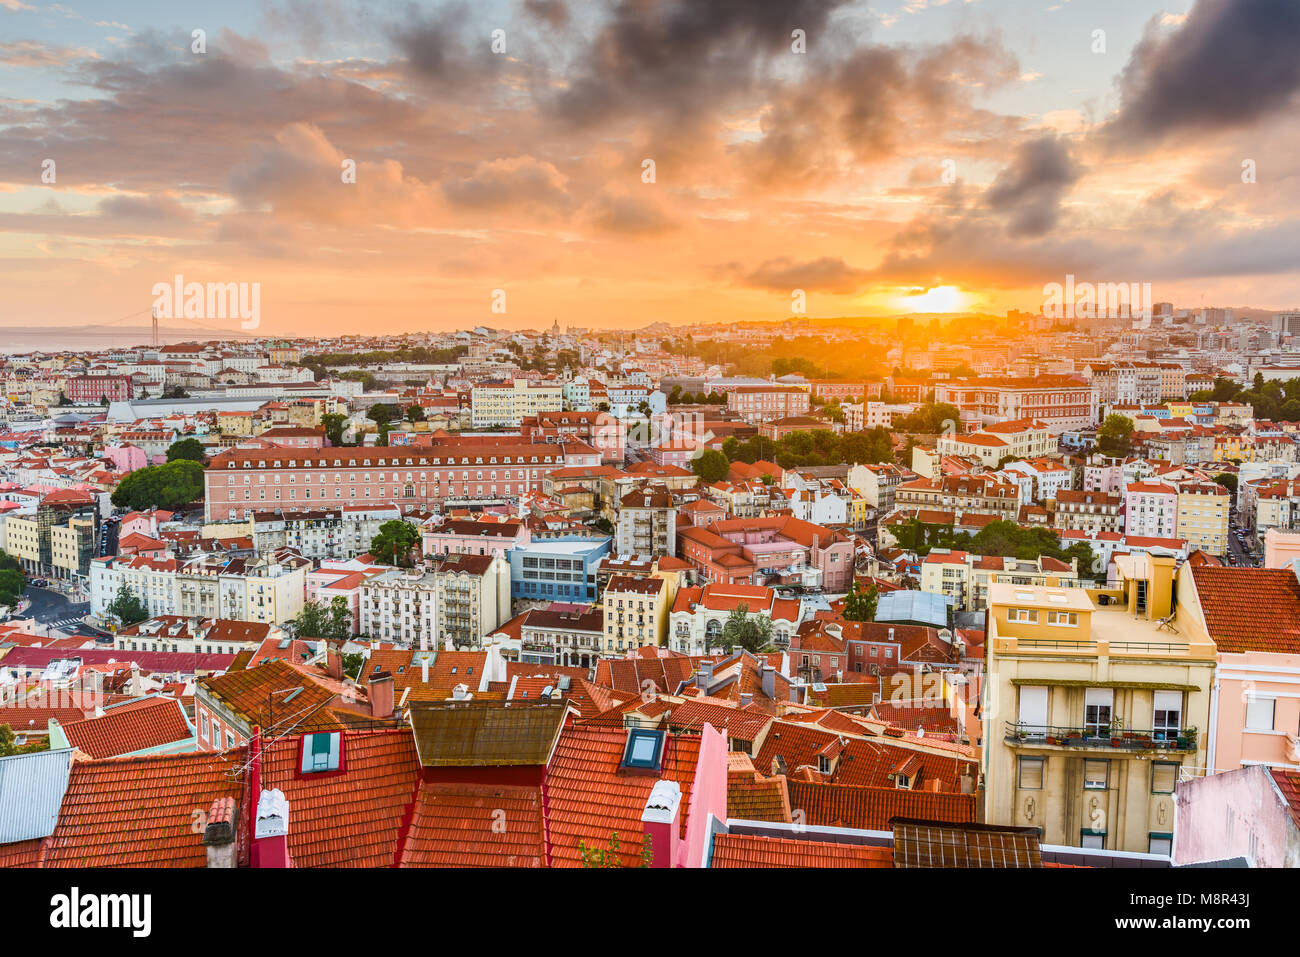 Lisbon, Portugal old town skyline. - Stock Image